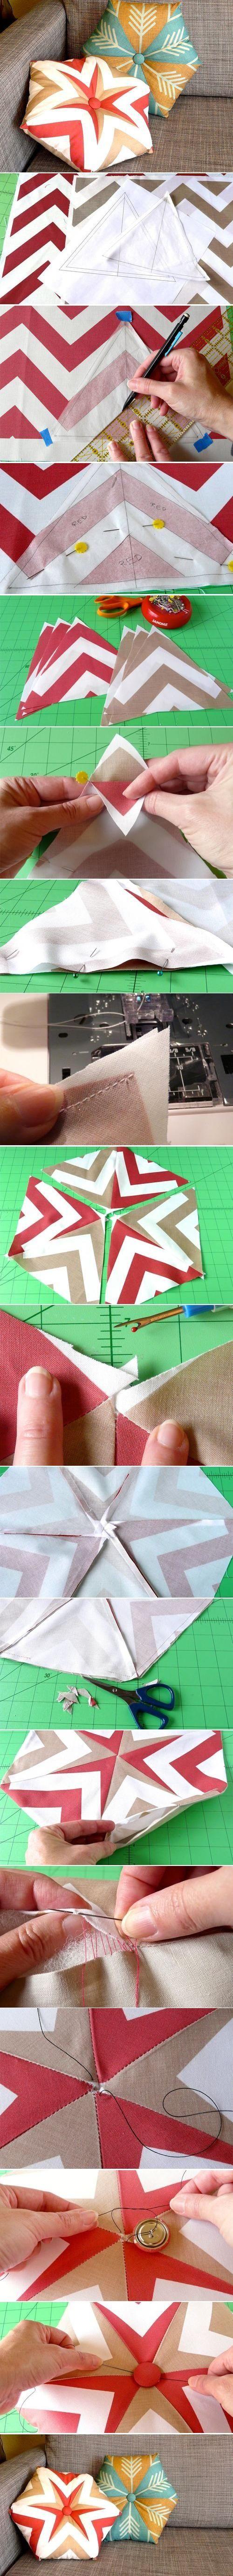 DIY Hexagonal tufted throw cushion by diyforever.  Add some spunk to the sofa.